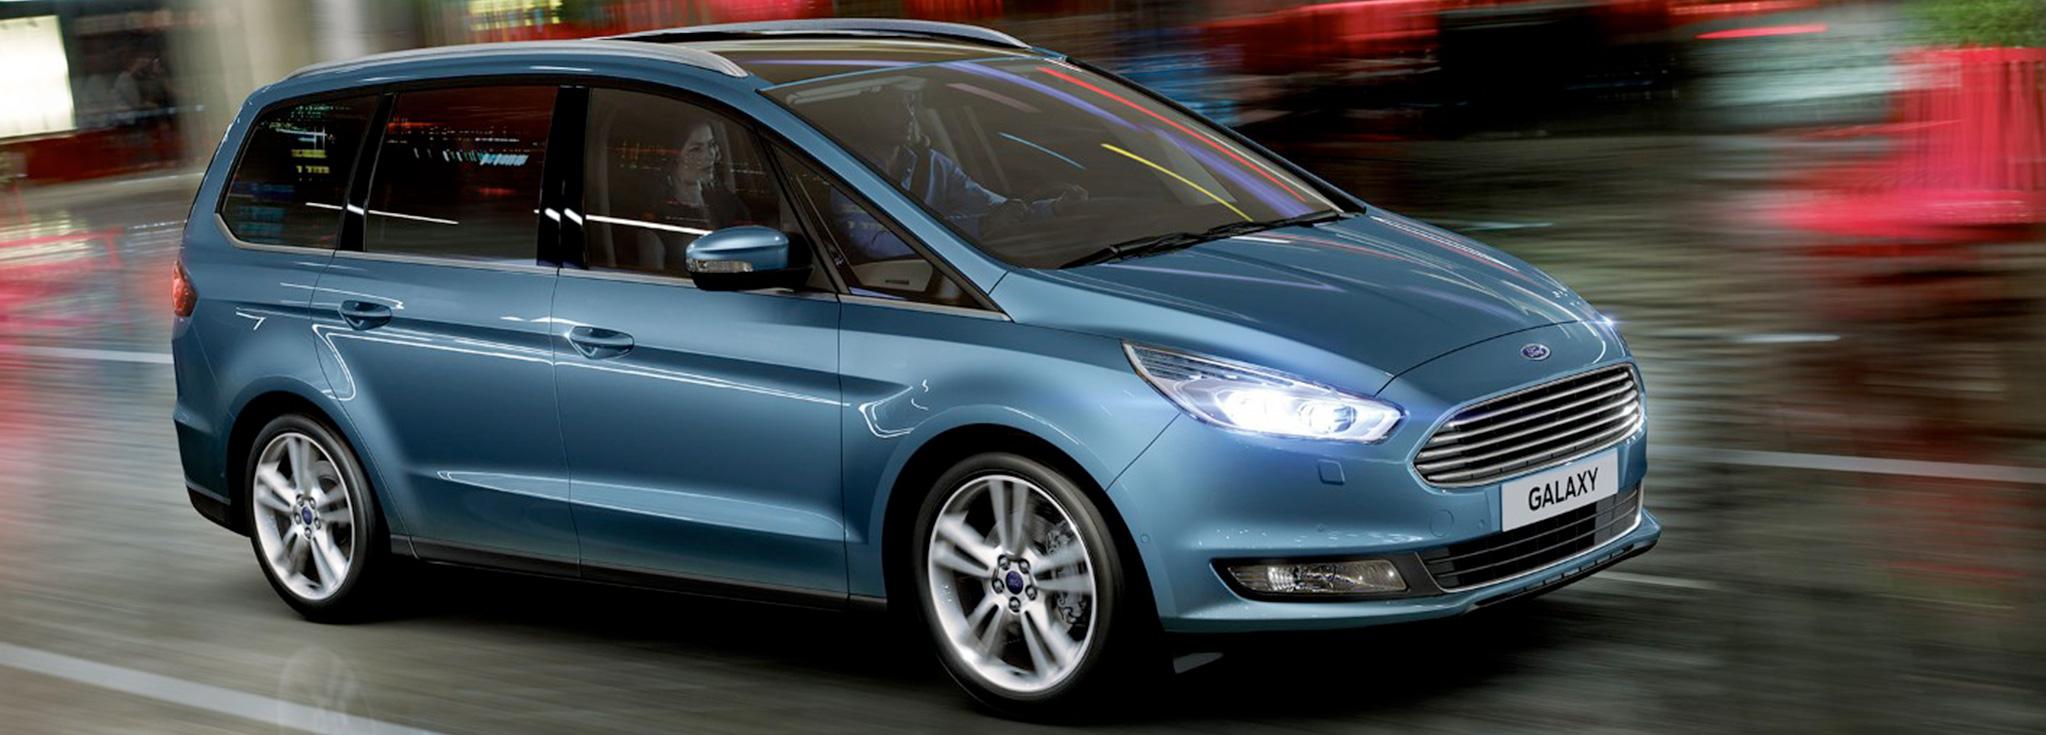 Exterior Ford Galaxy azul